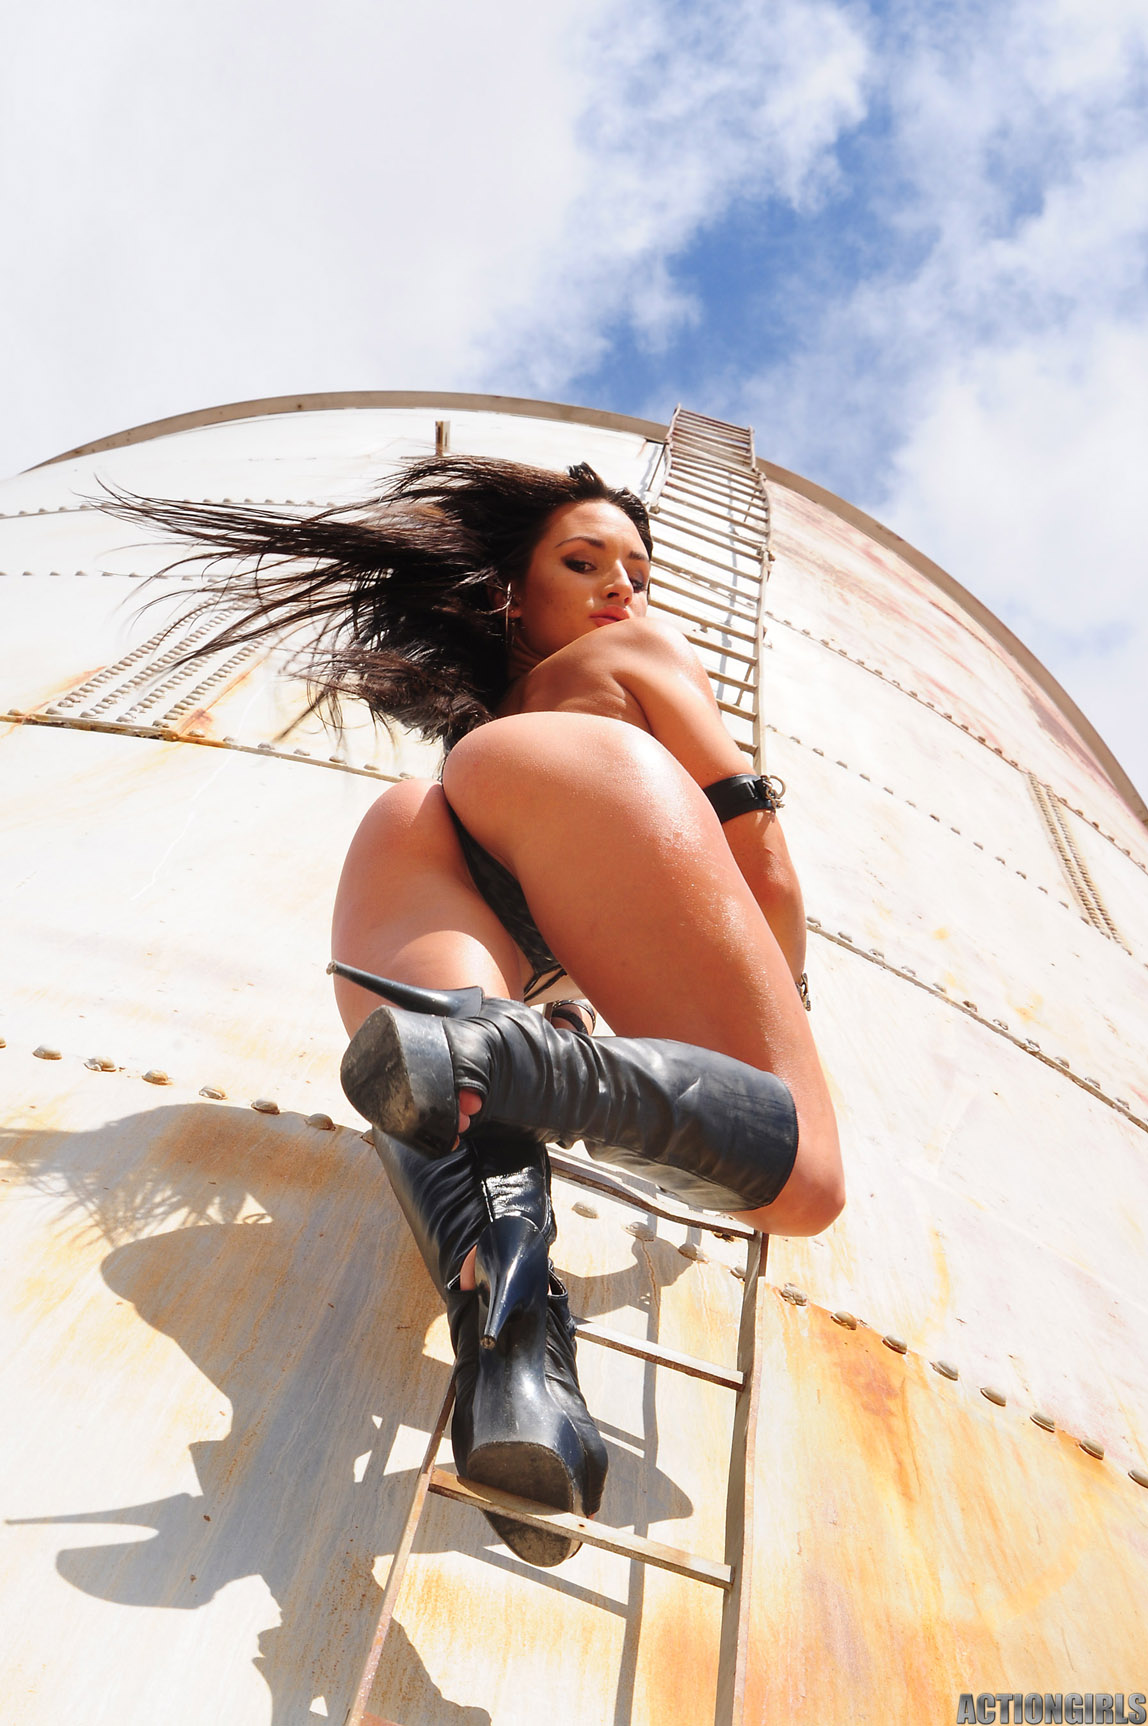 http://hotcelebrities-vk.com/images/MODELS/FR/Rosie-Roff/1-Rosie-Roff-Model-Naked/Rosie%20Roff%2056567.jpg